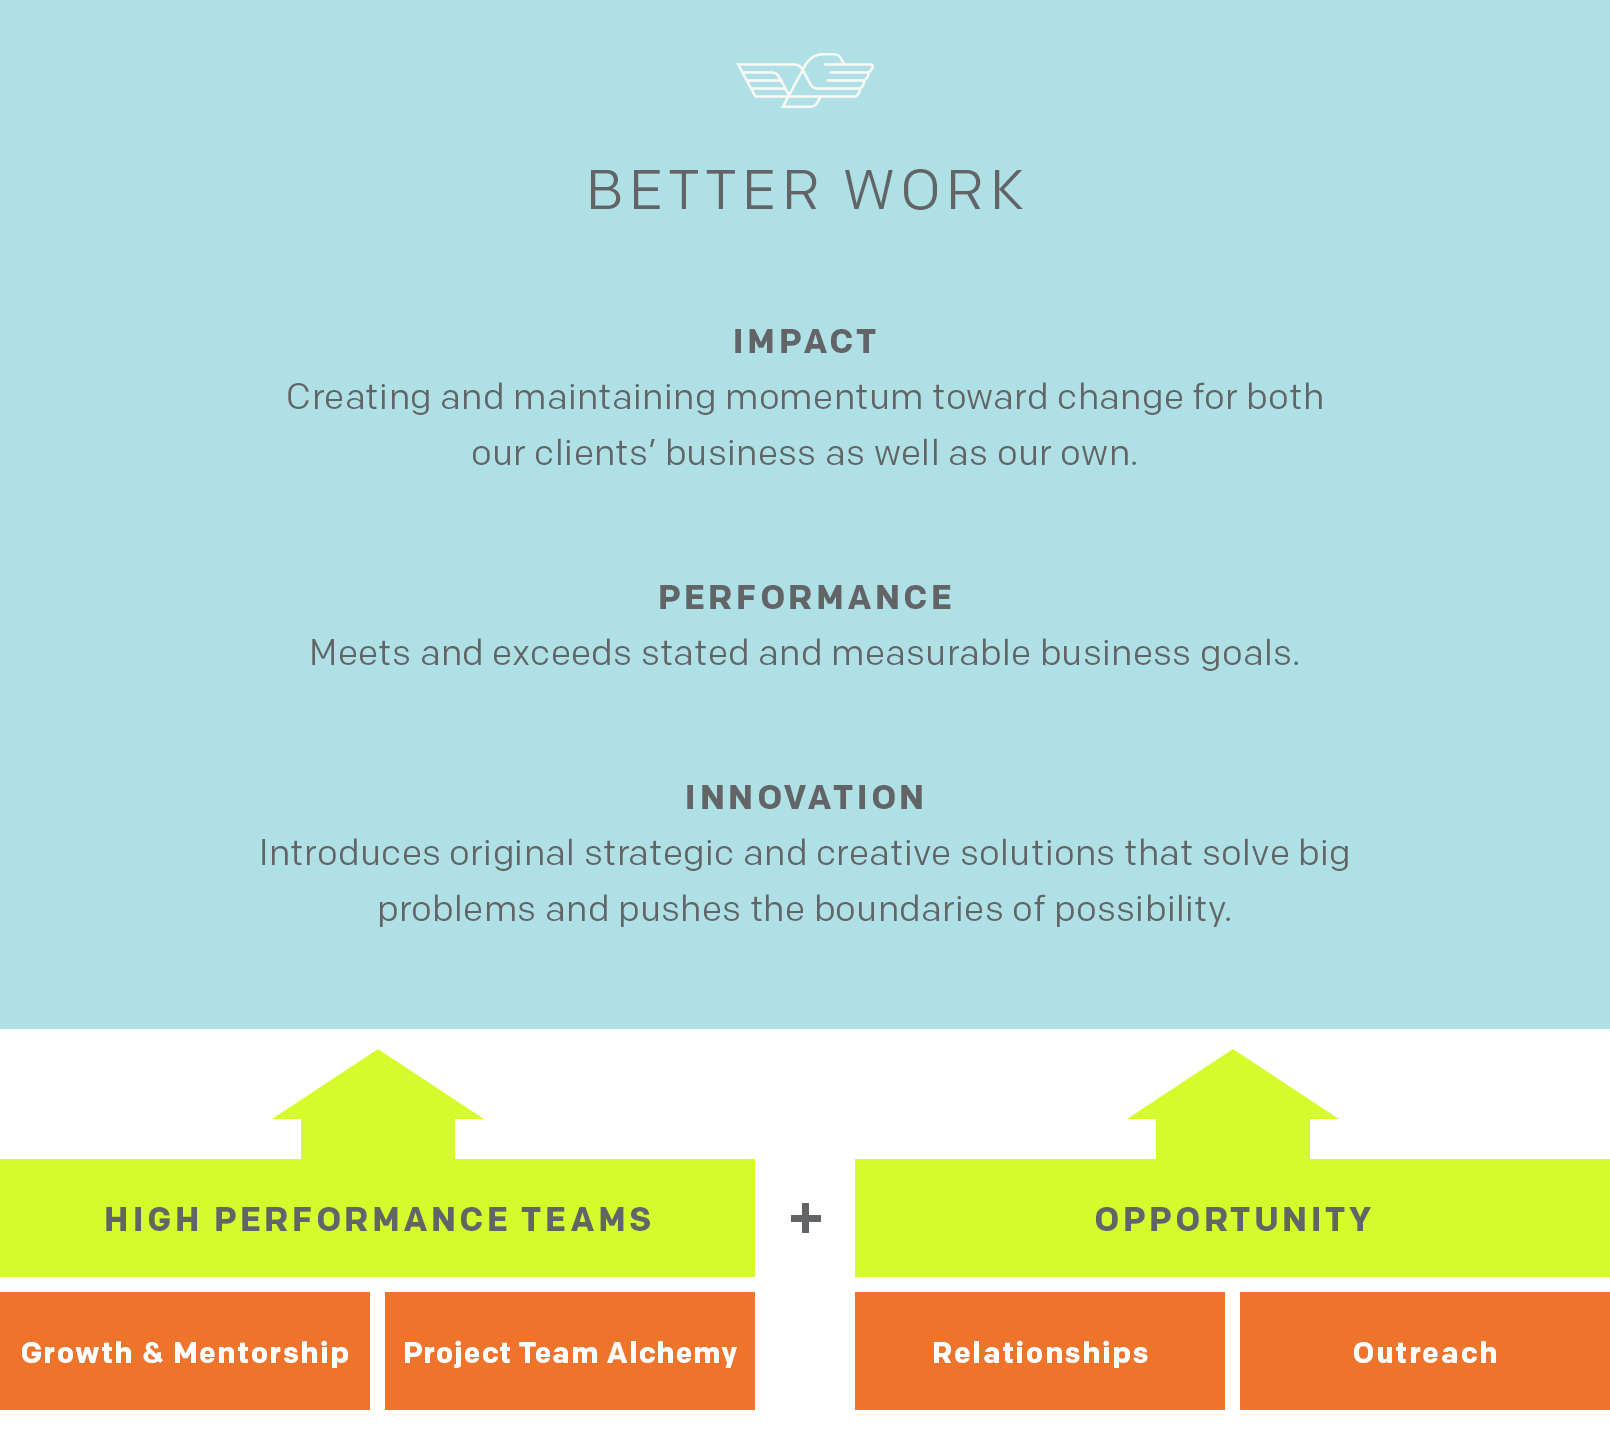 ZJ_Blog_Image_LeadershipModel.png#asset: